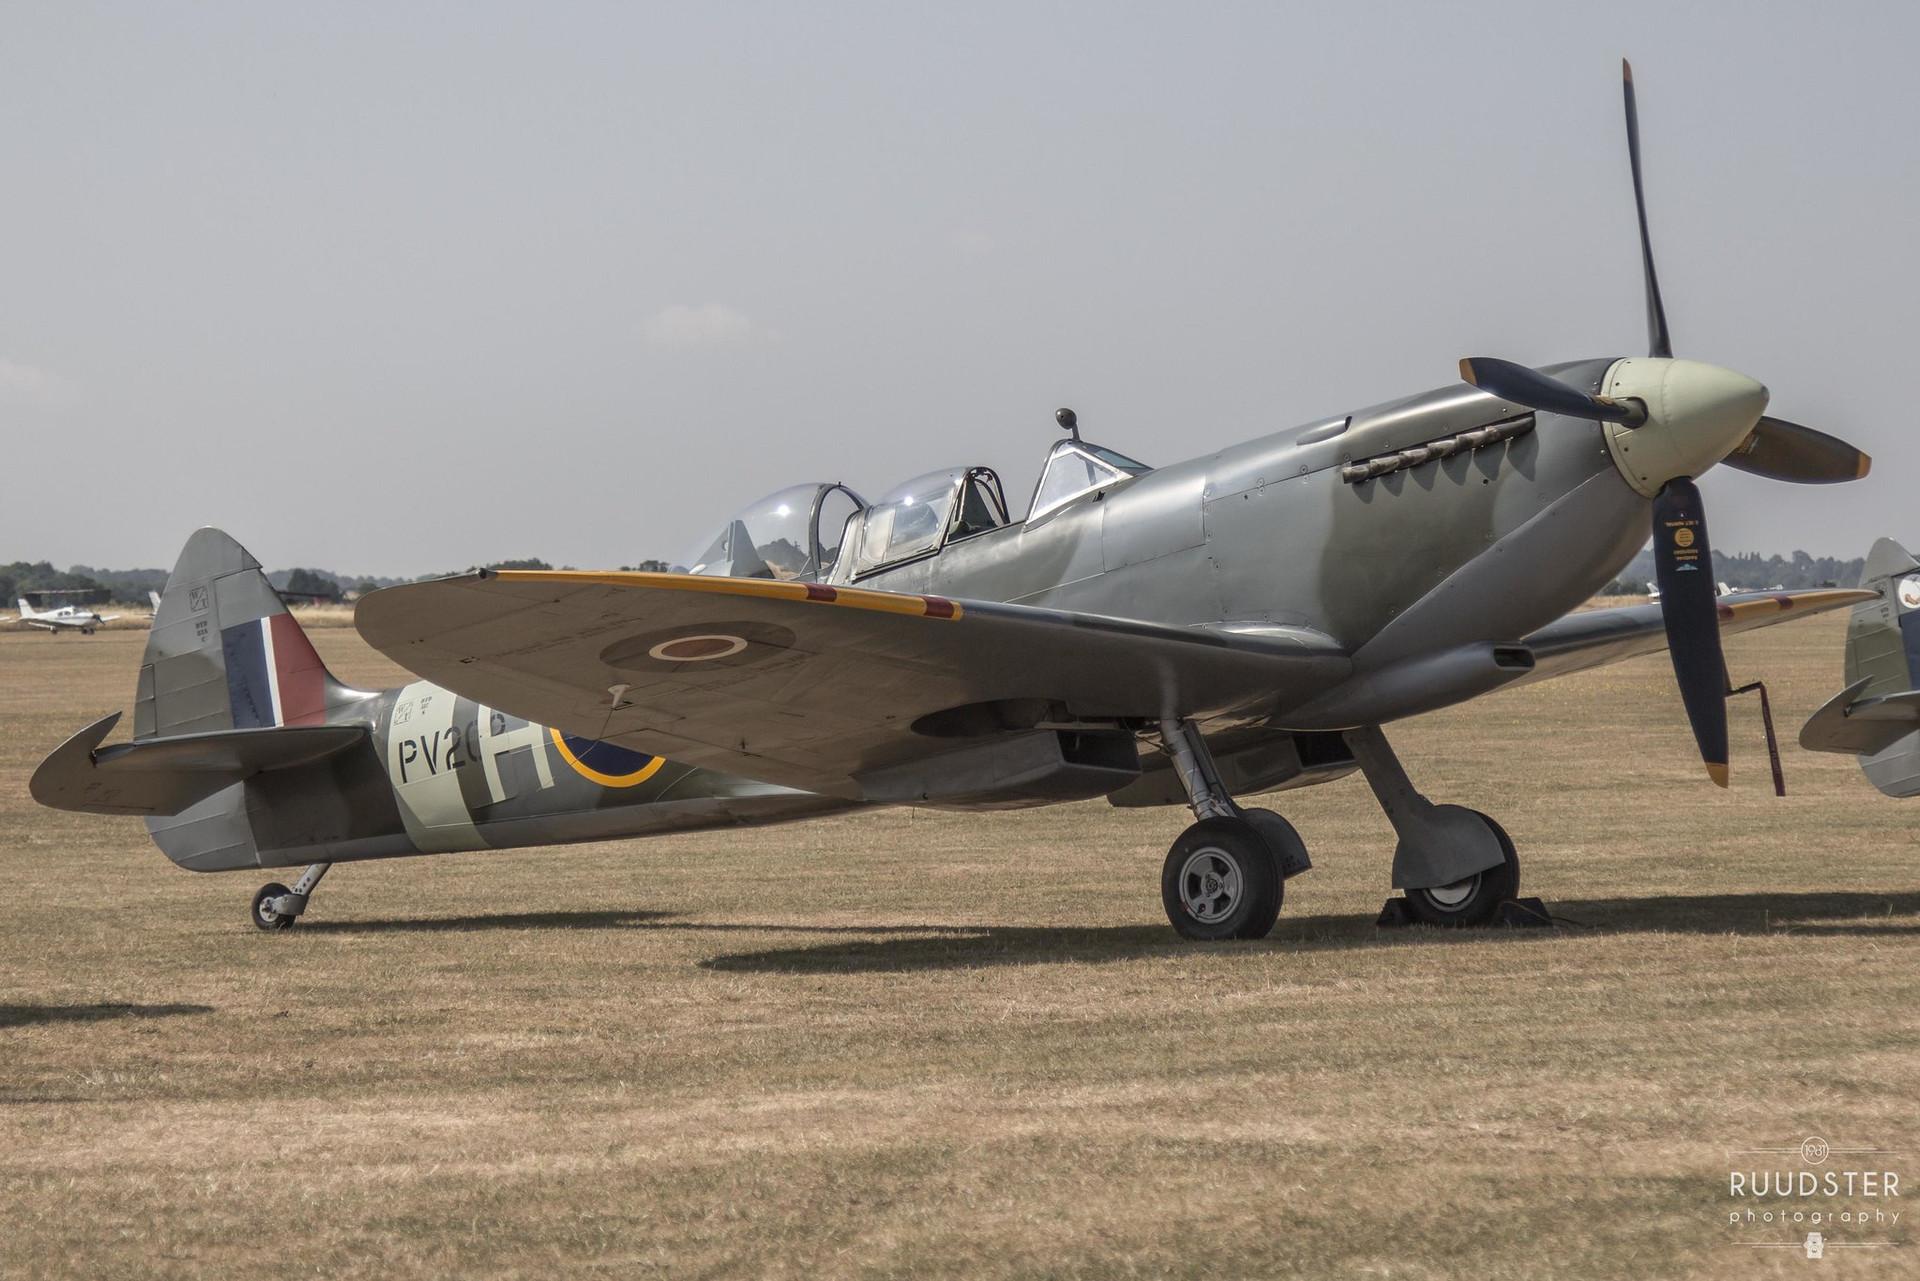 PV202   Builf: 1944 - Supermarine Spitfire Mk.T.iX